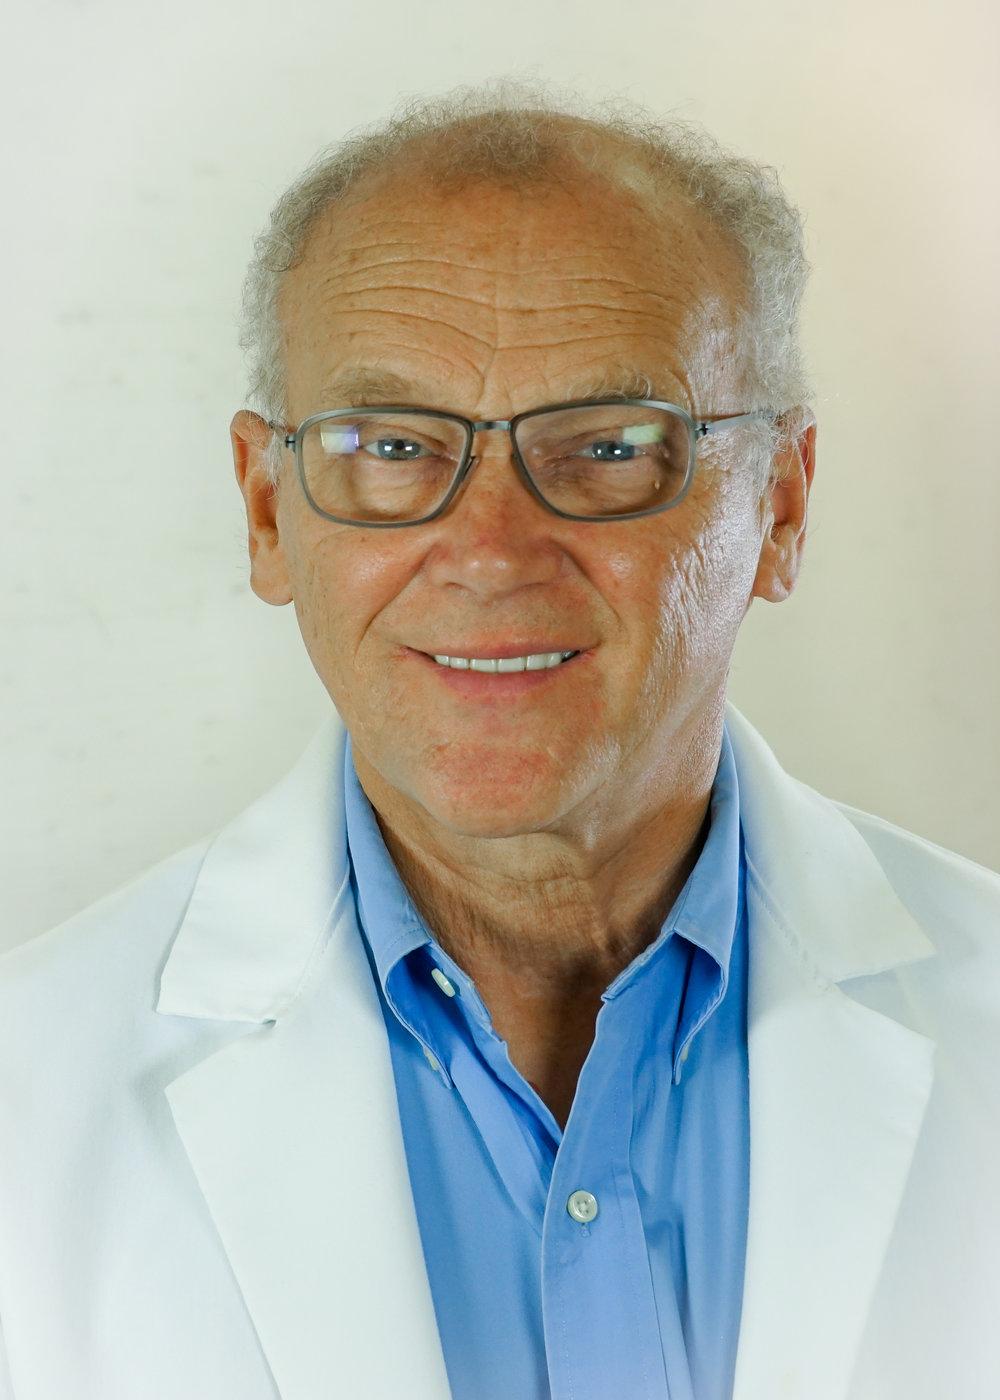 ACNJ Founder - Dr. Peter Kadar L.Ac D.O.M.